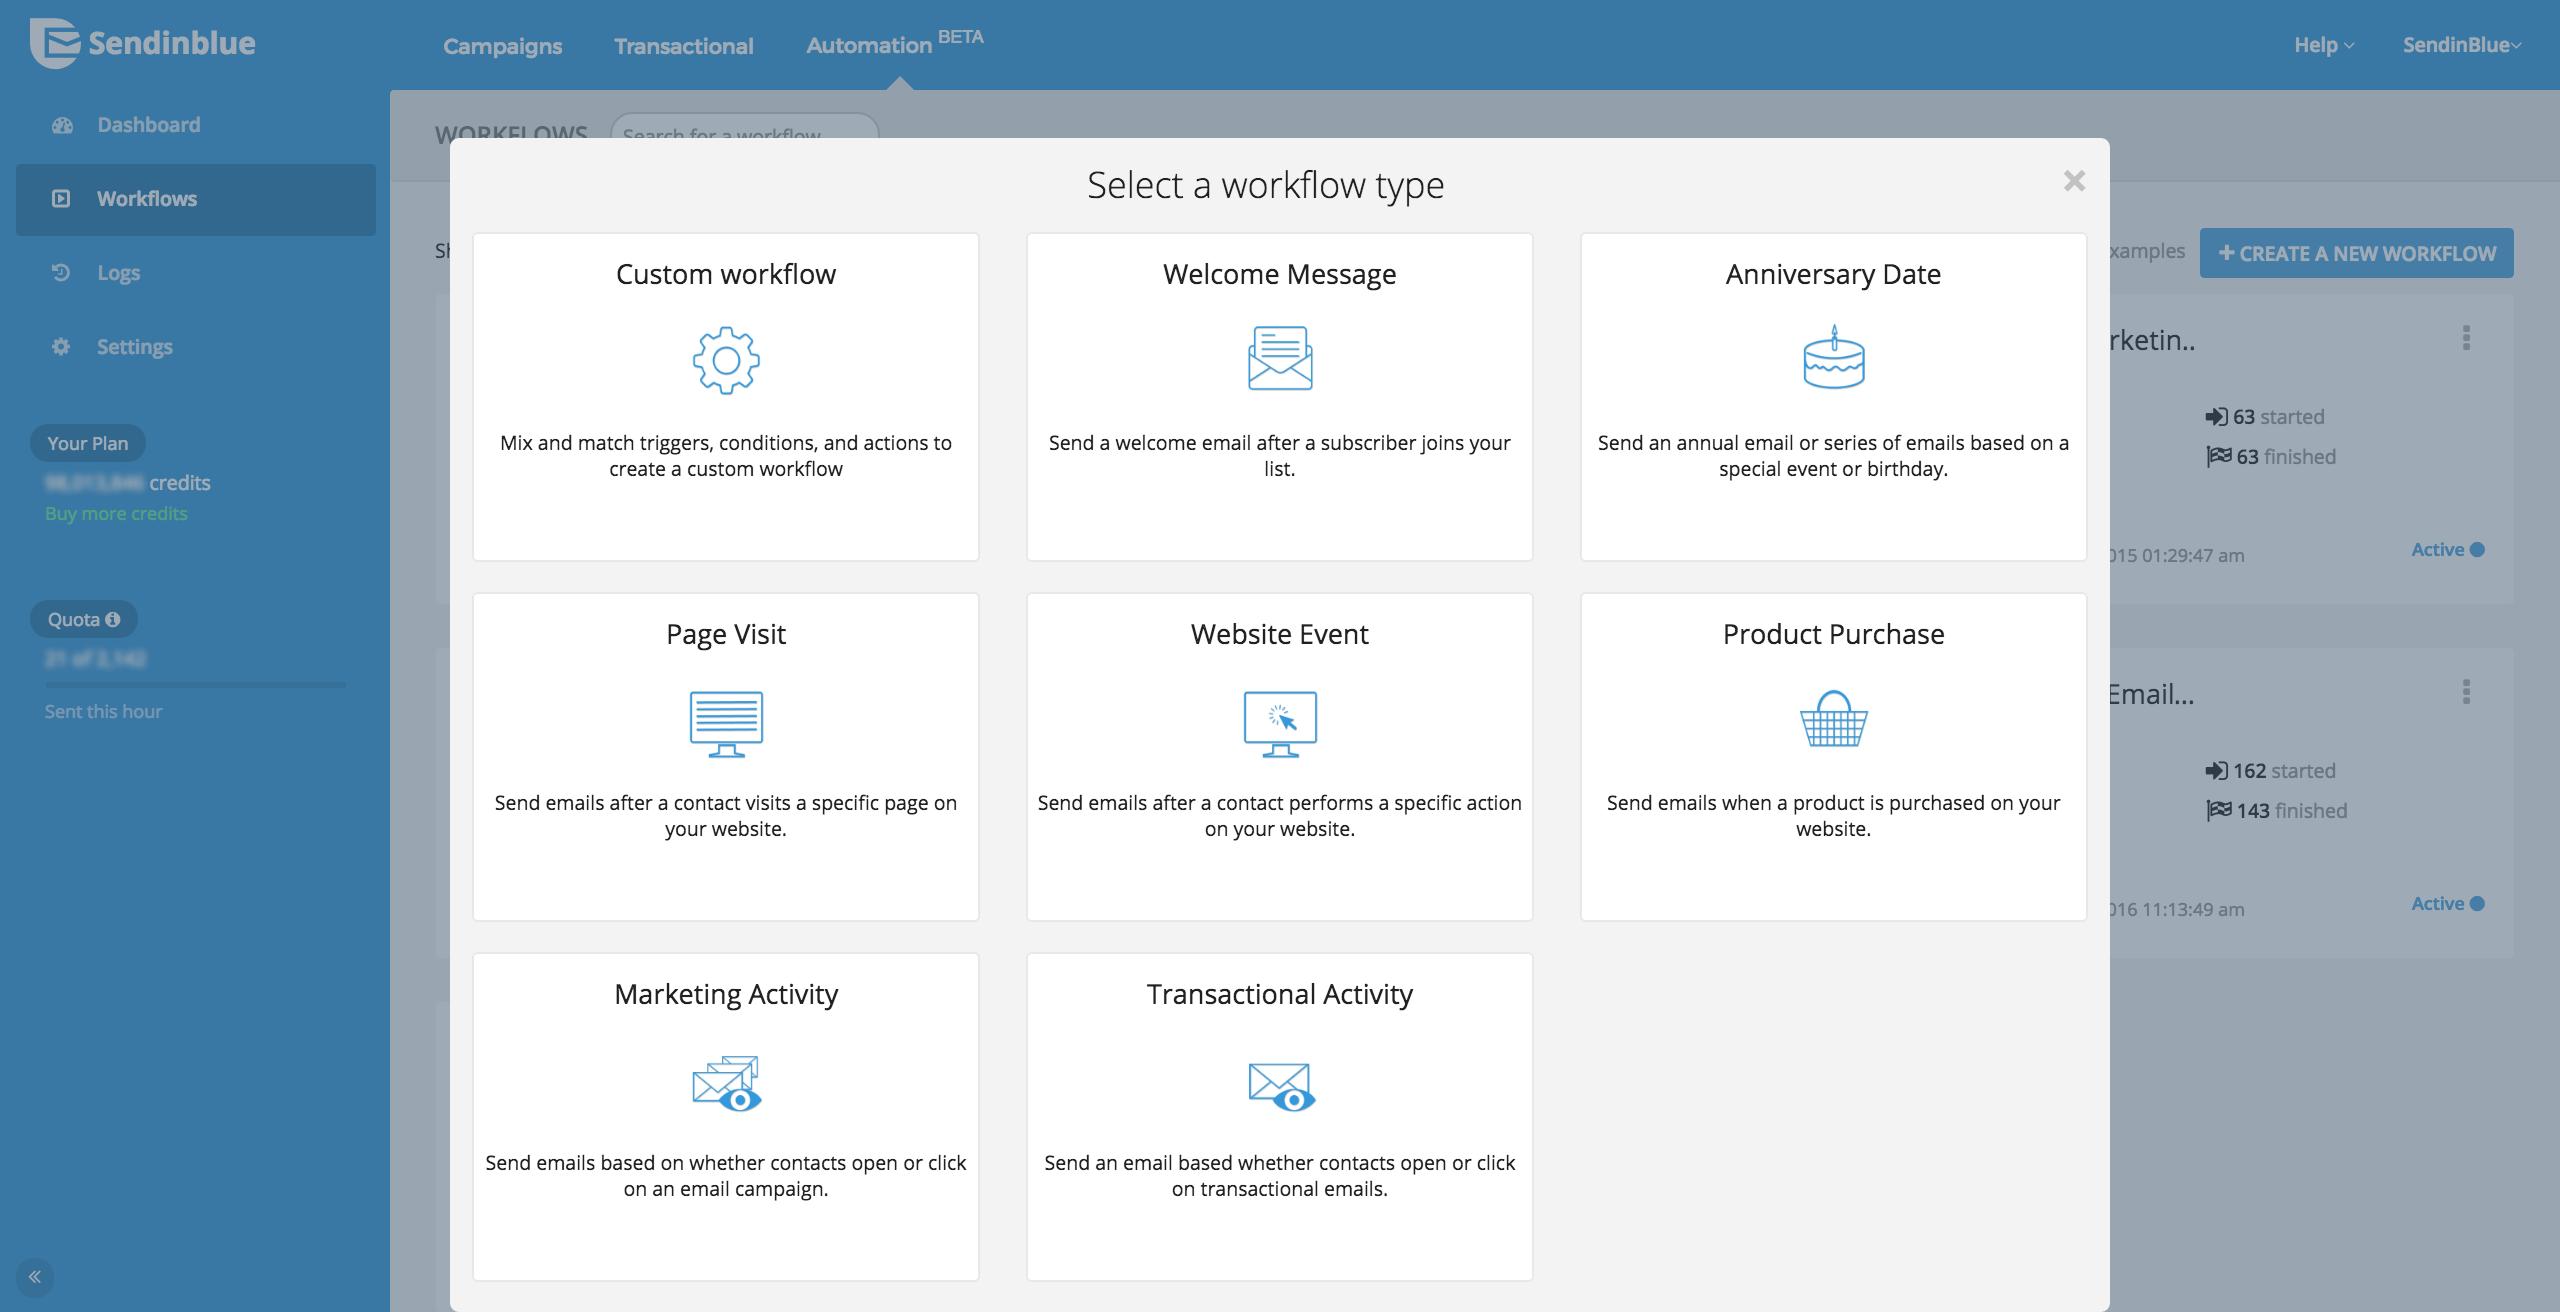 Sendinblue Software - Marketing automation workflow templates